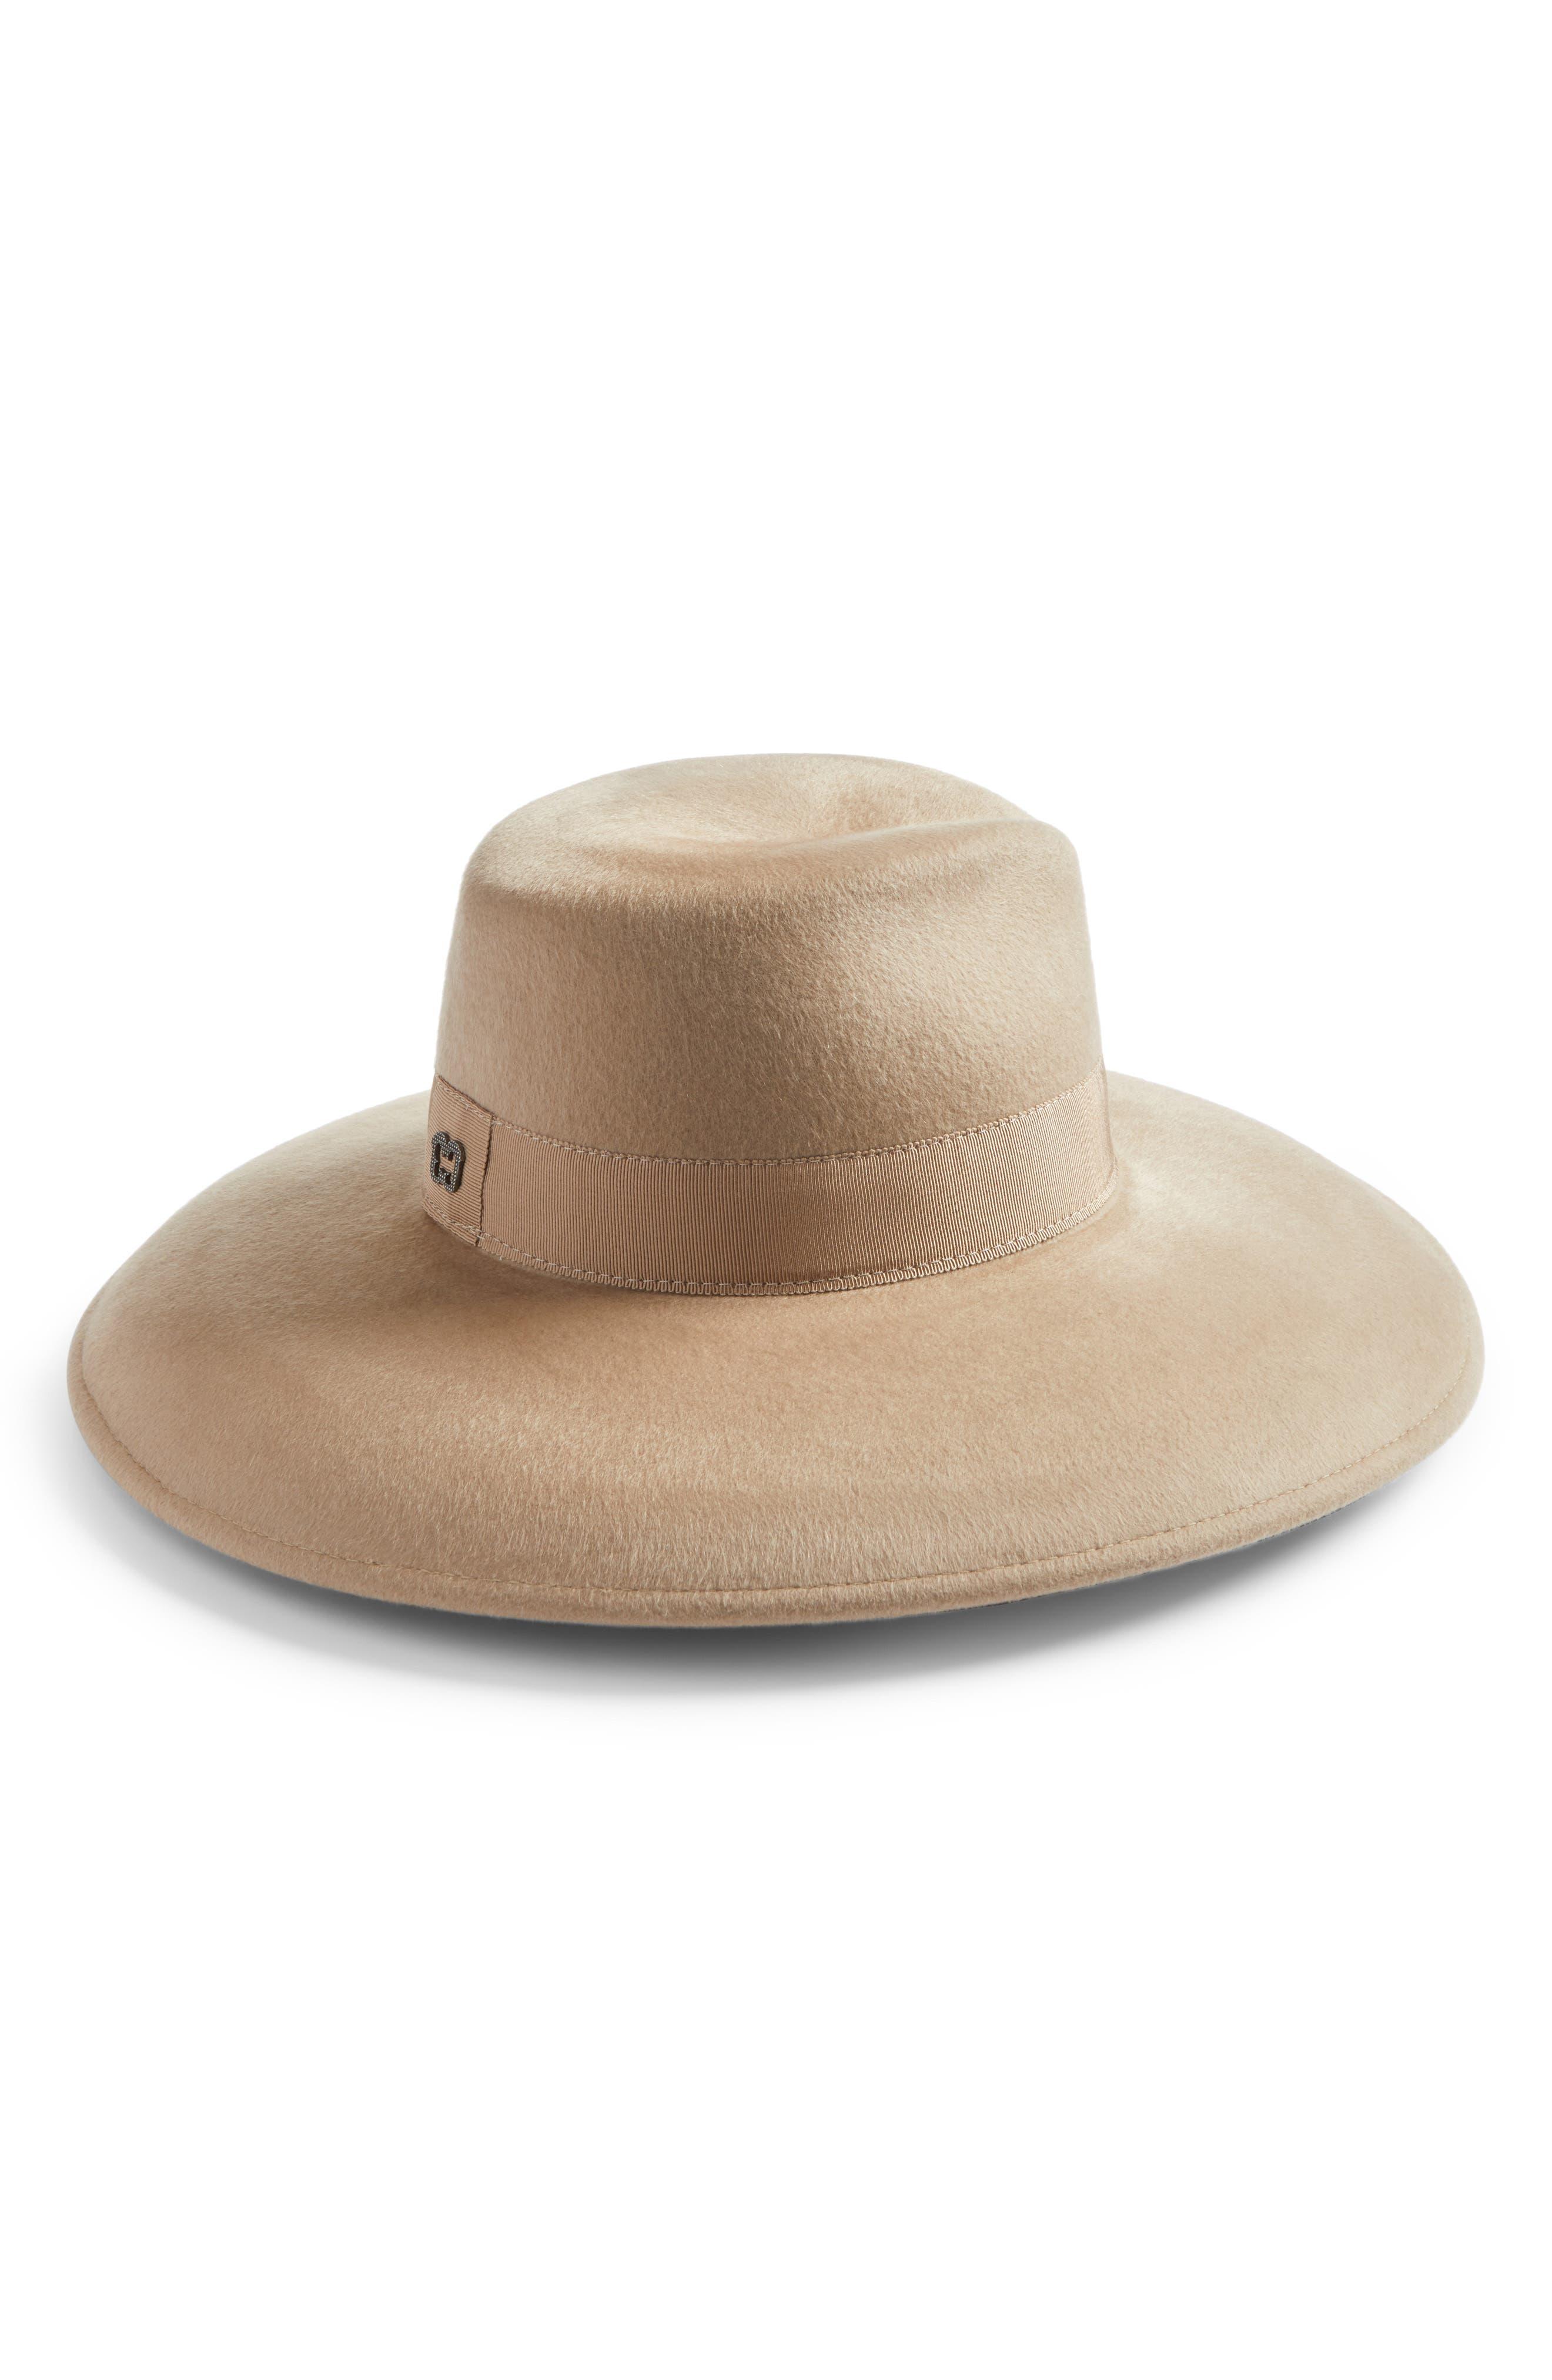 Main Image - Eric Javits Camille Wool Floppy Hat